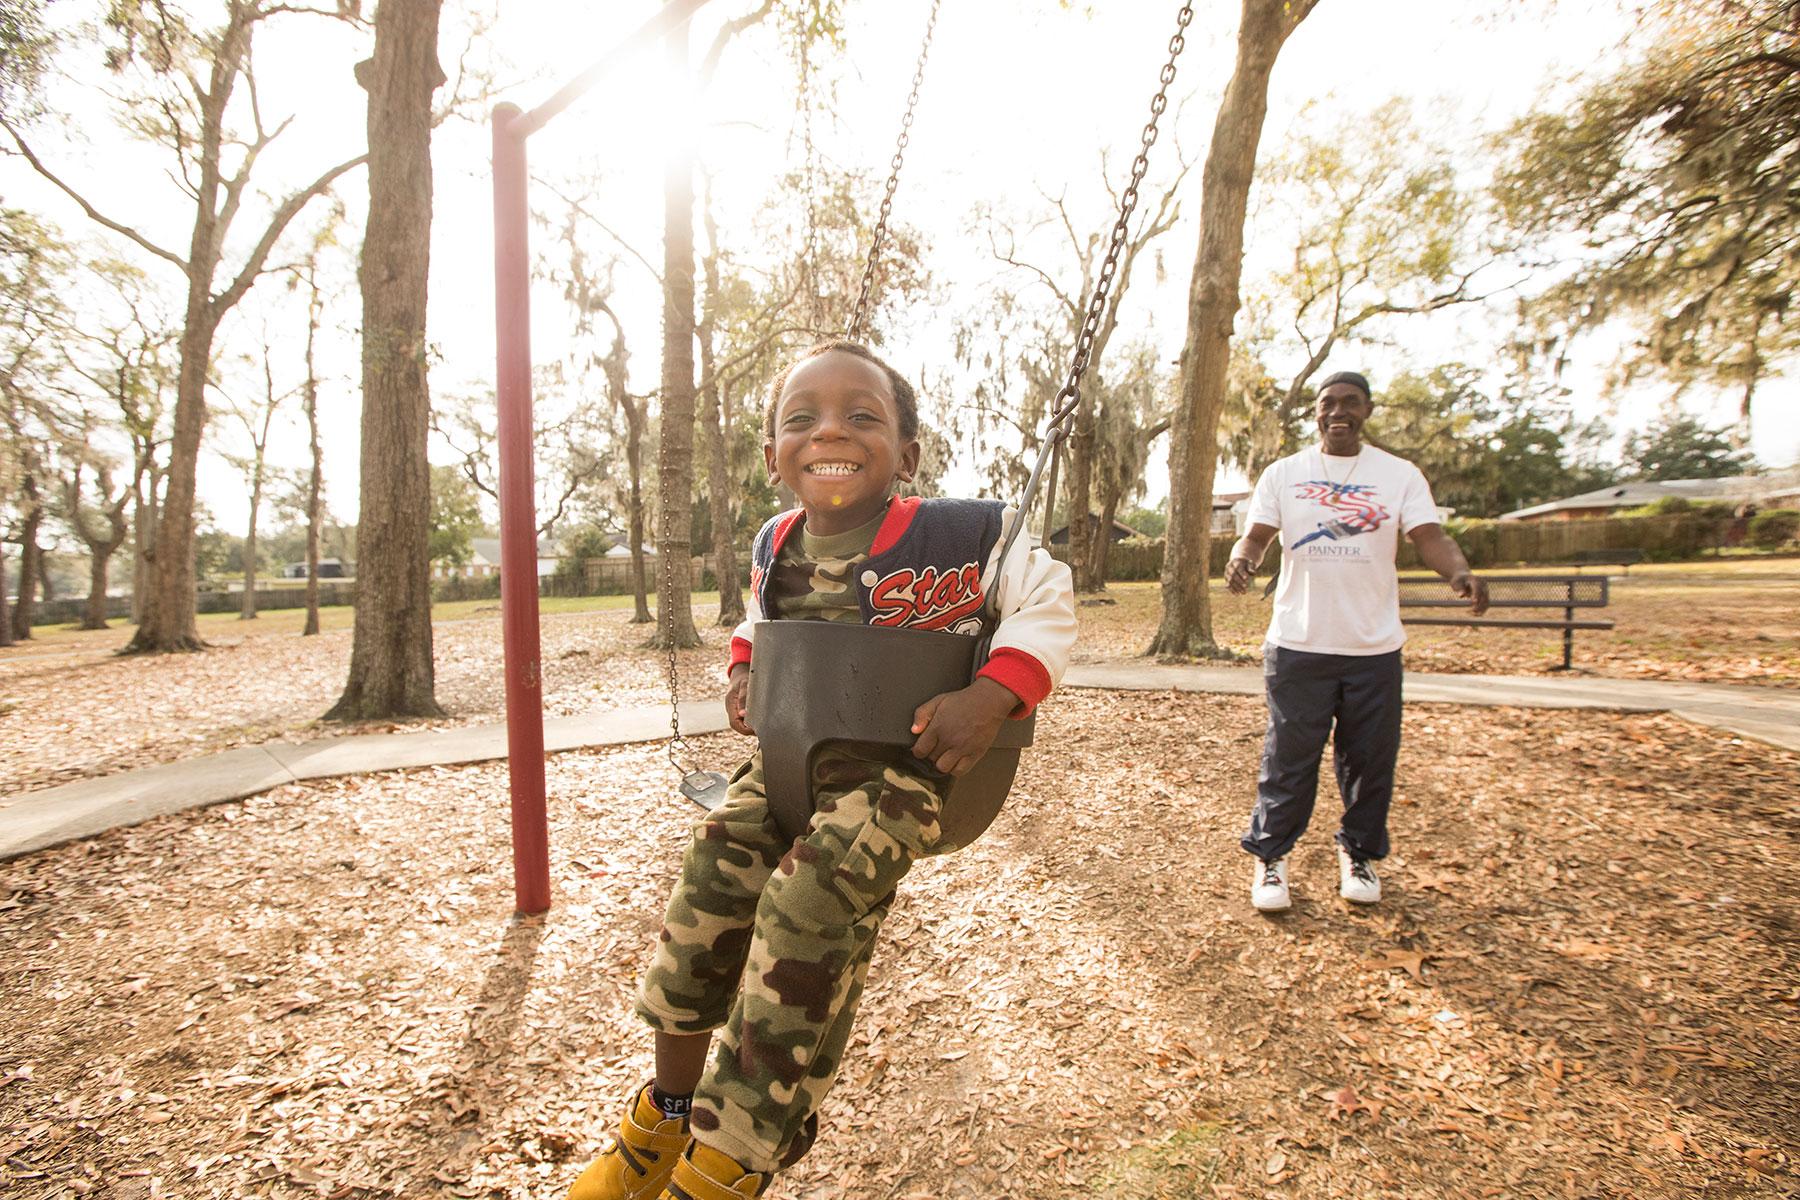 Impact - Children's Home Society of Florida